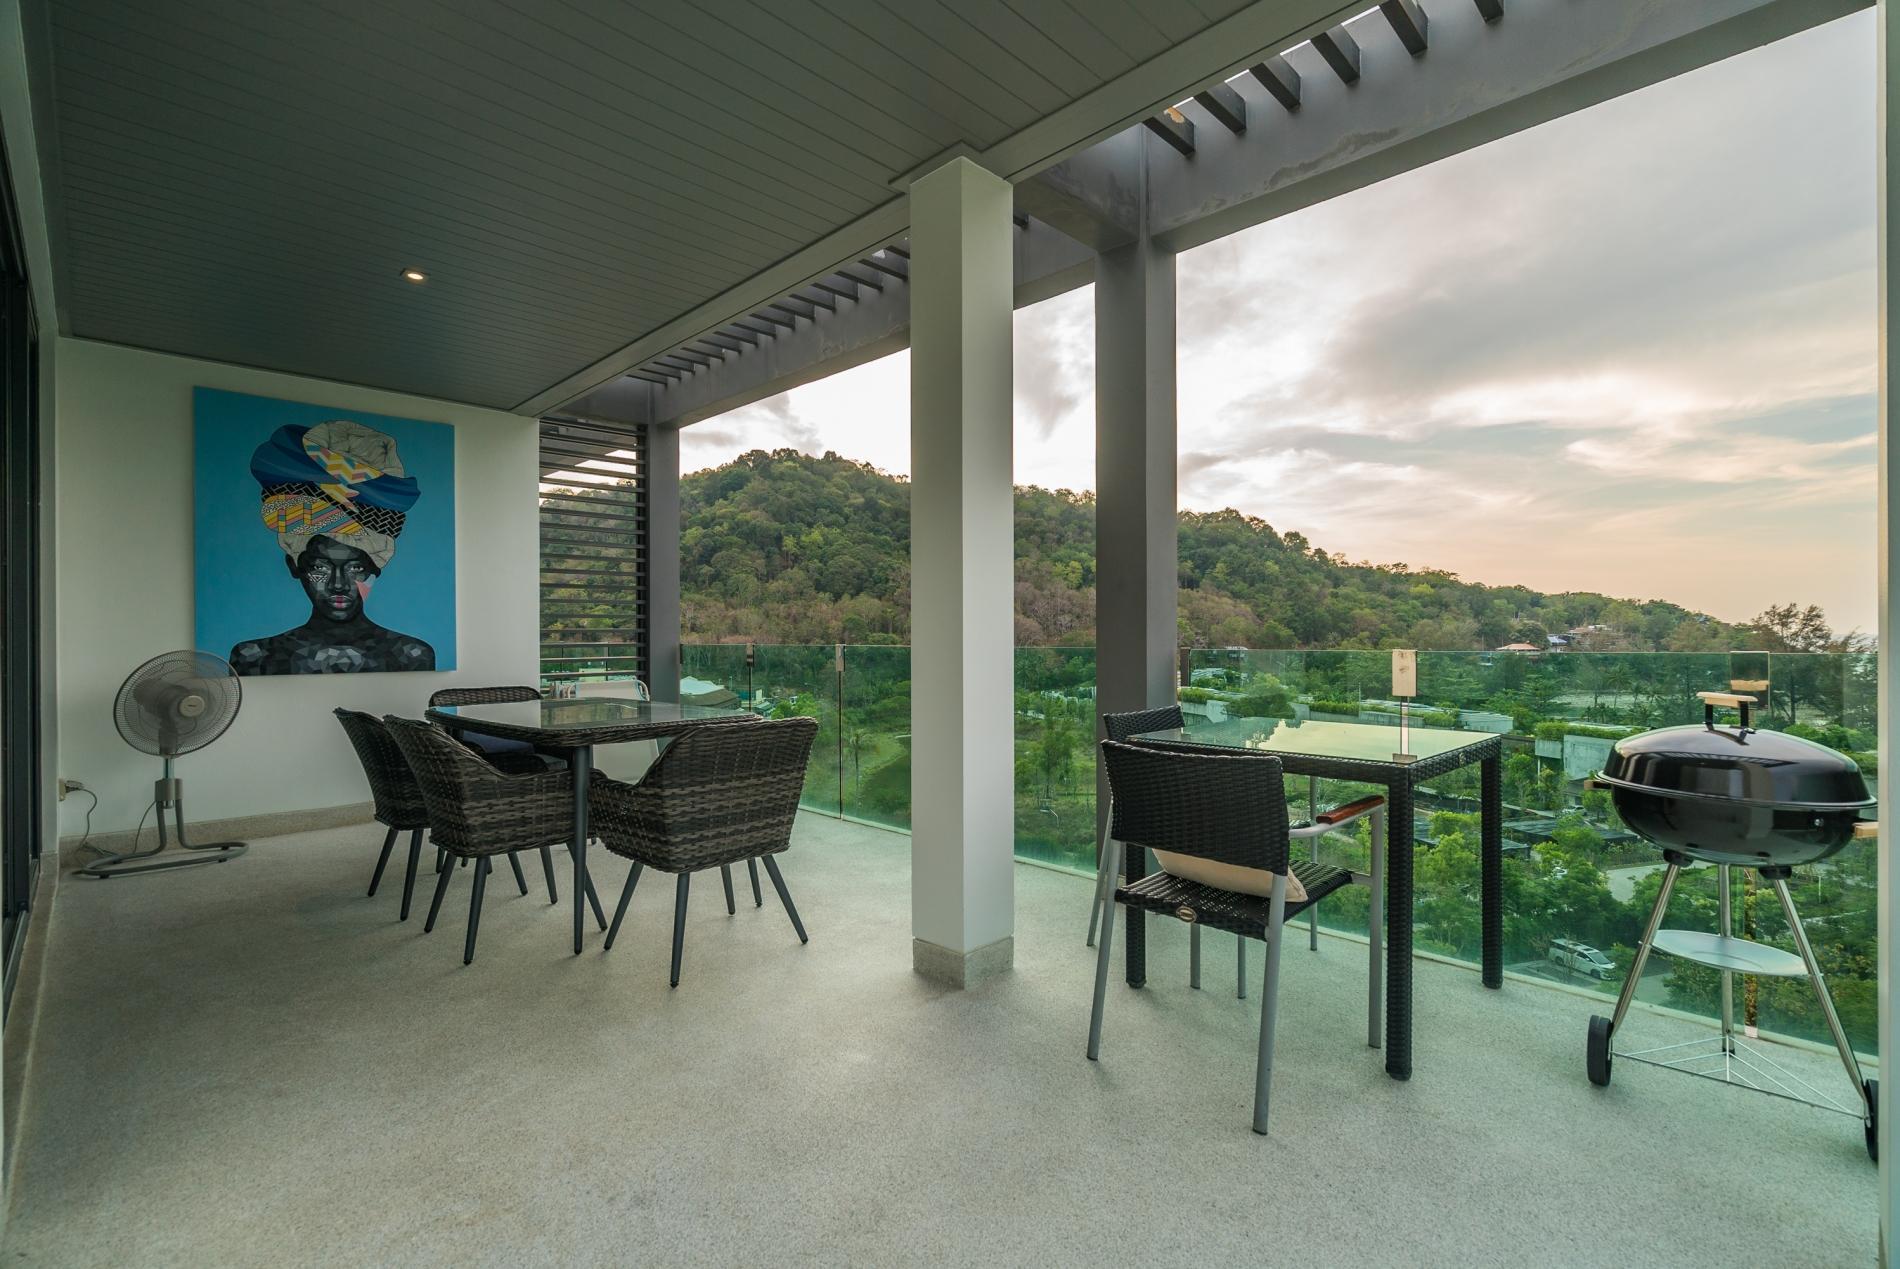 Apartment Twin Sands 1406 - Panoramic seaview apartment walk to beach  shared pool photo 17053746